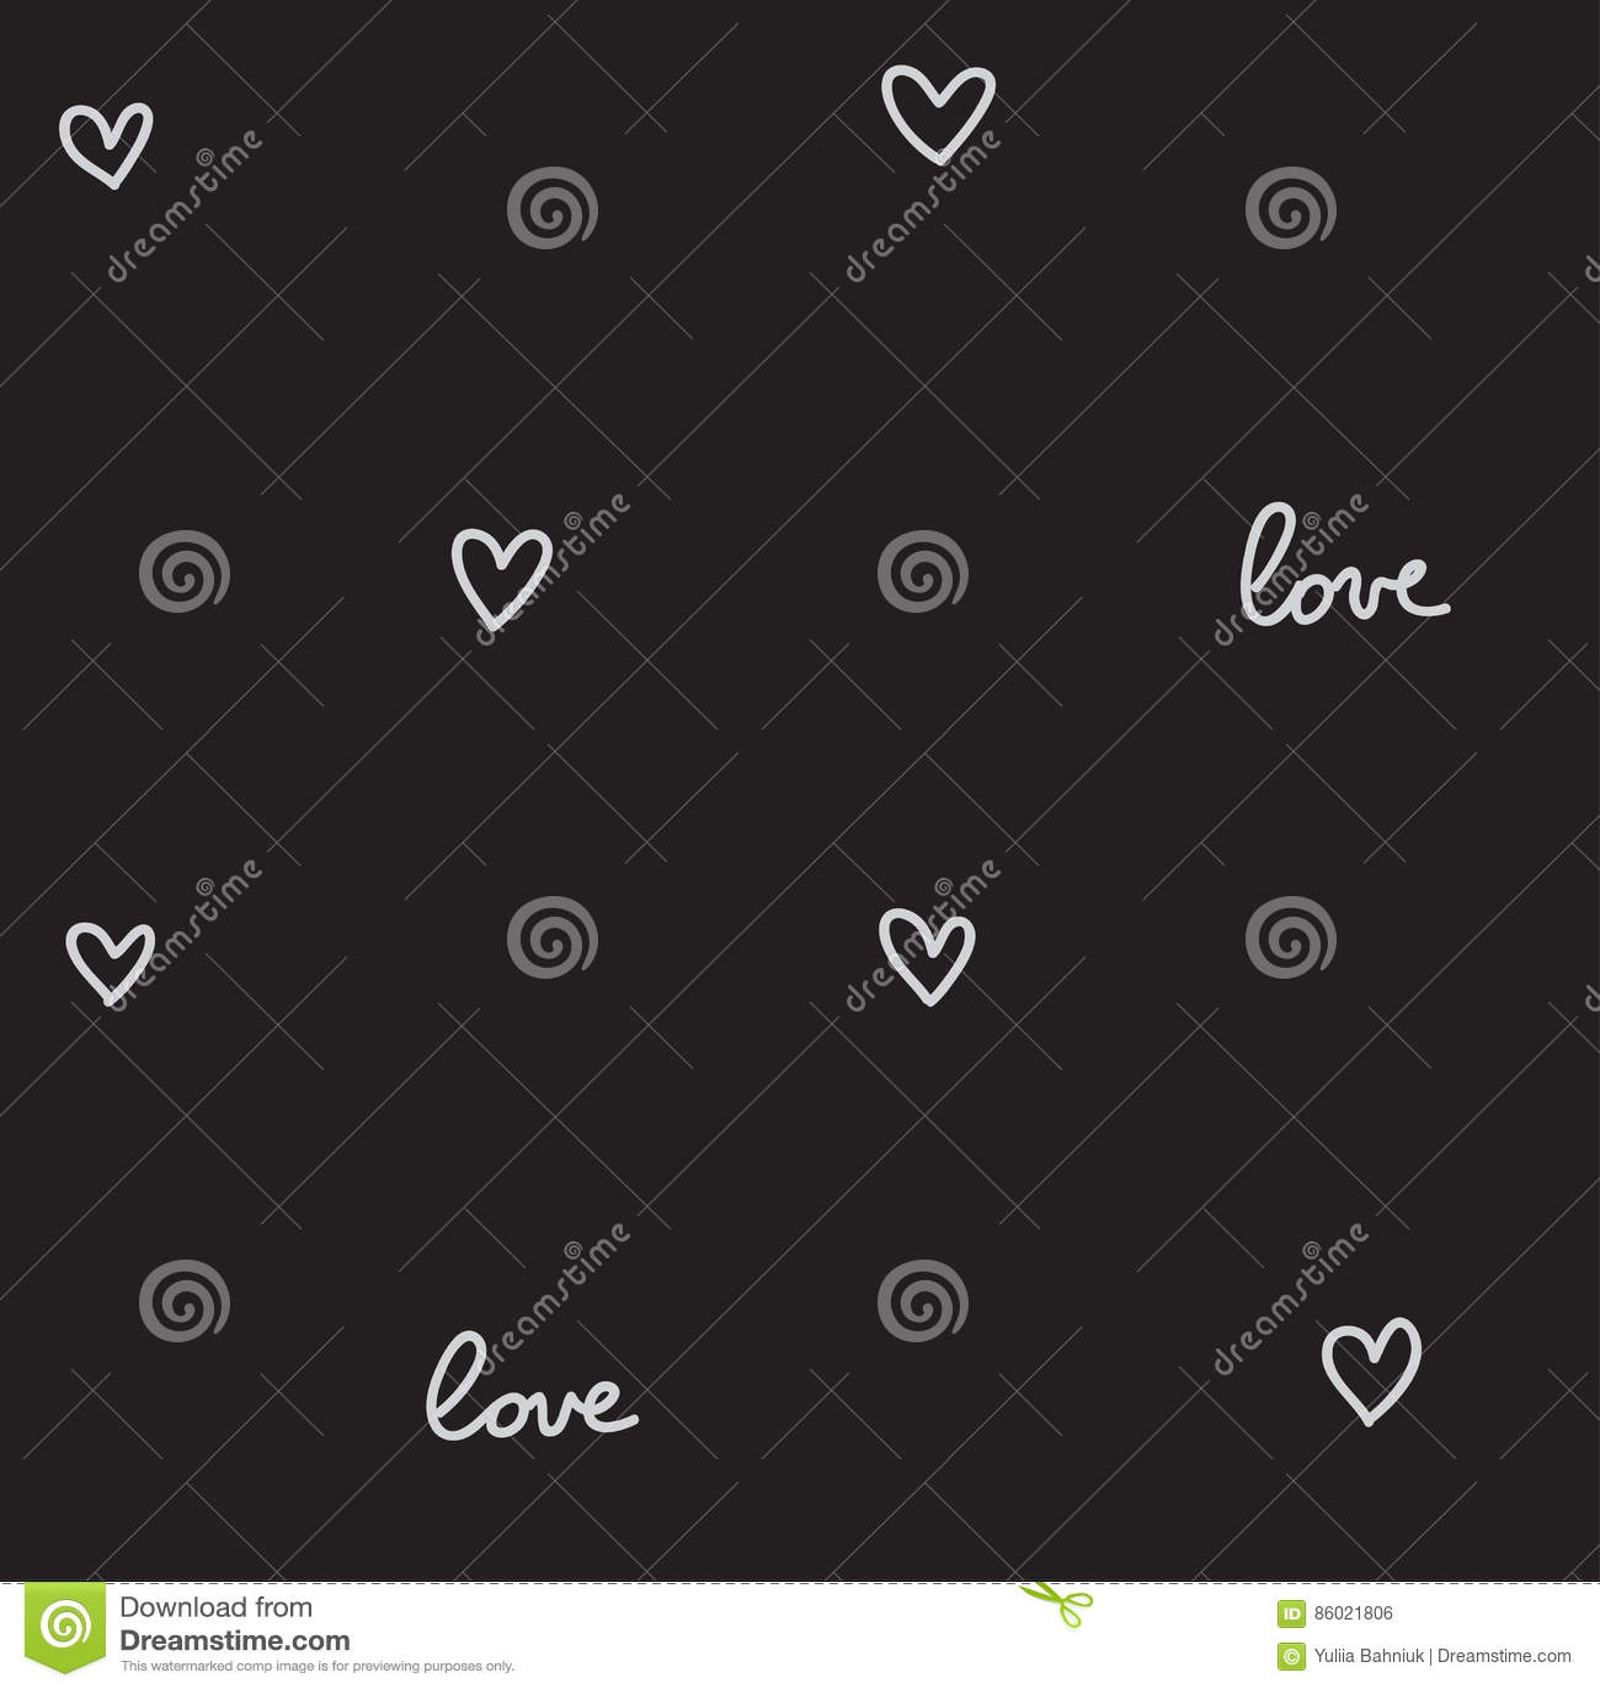 Hearts seamless pattern black